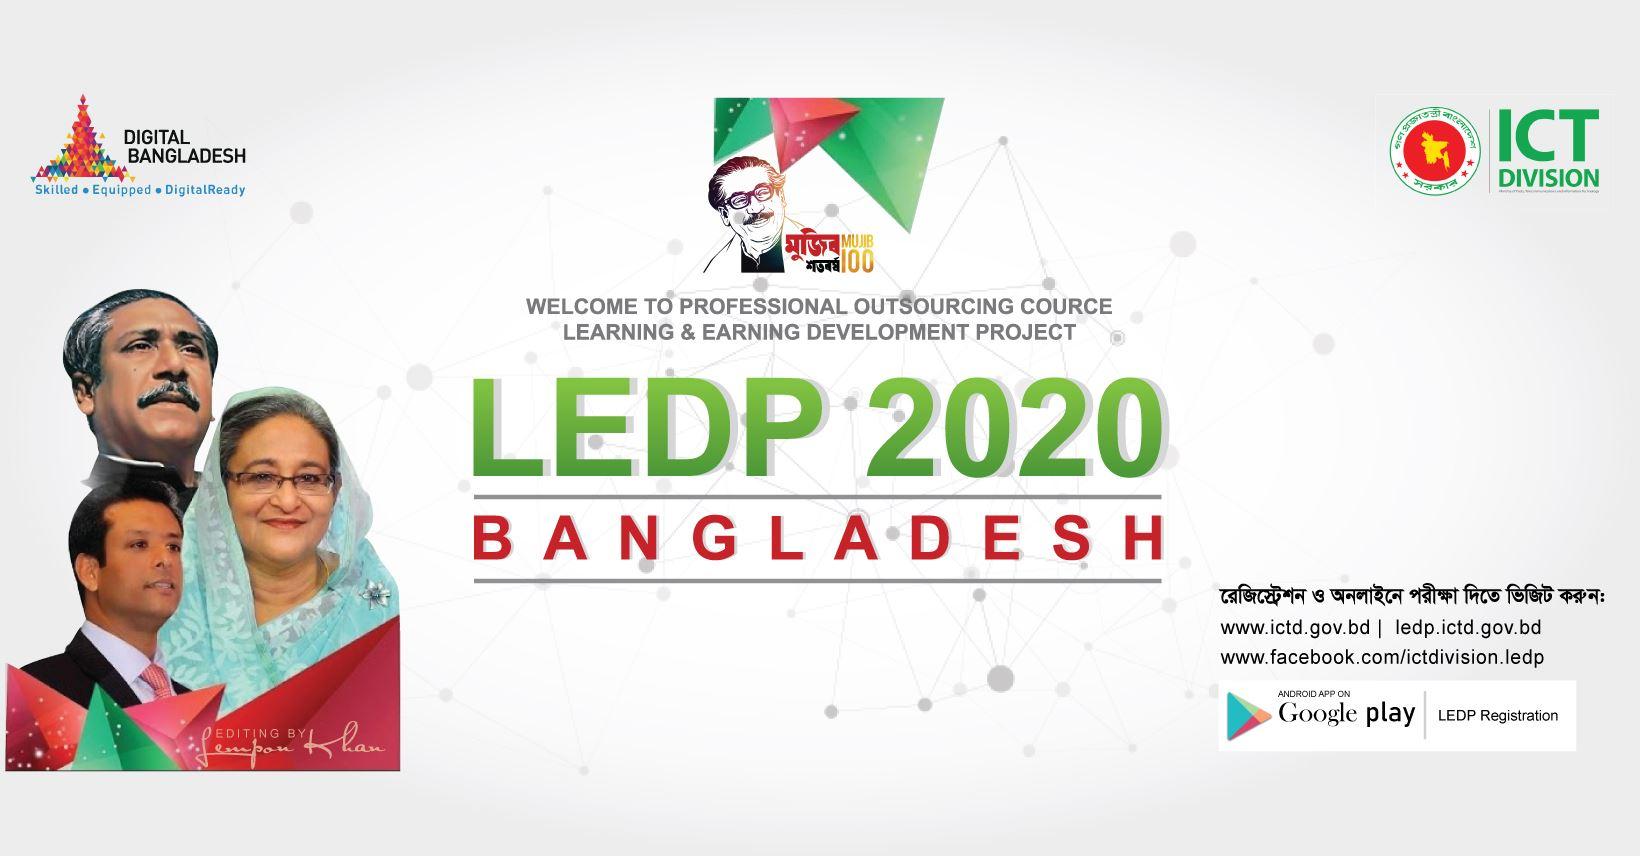 LEDP's starts free training in Cumilla, Noakhali, Lakshmipur and Chandpur